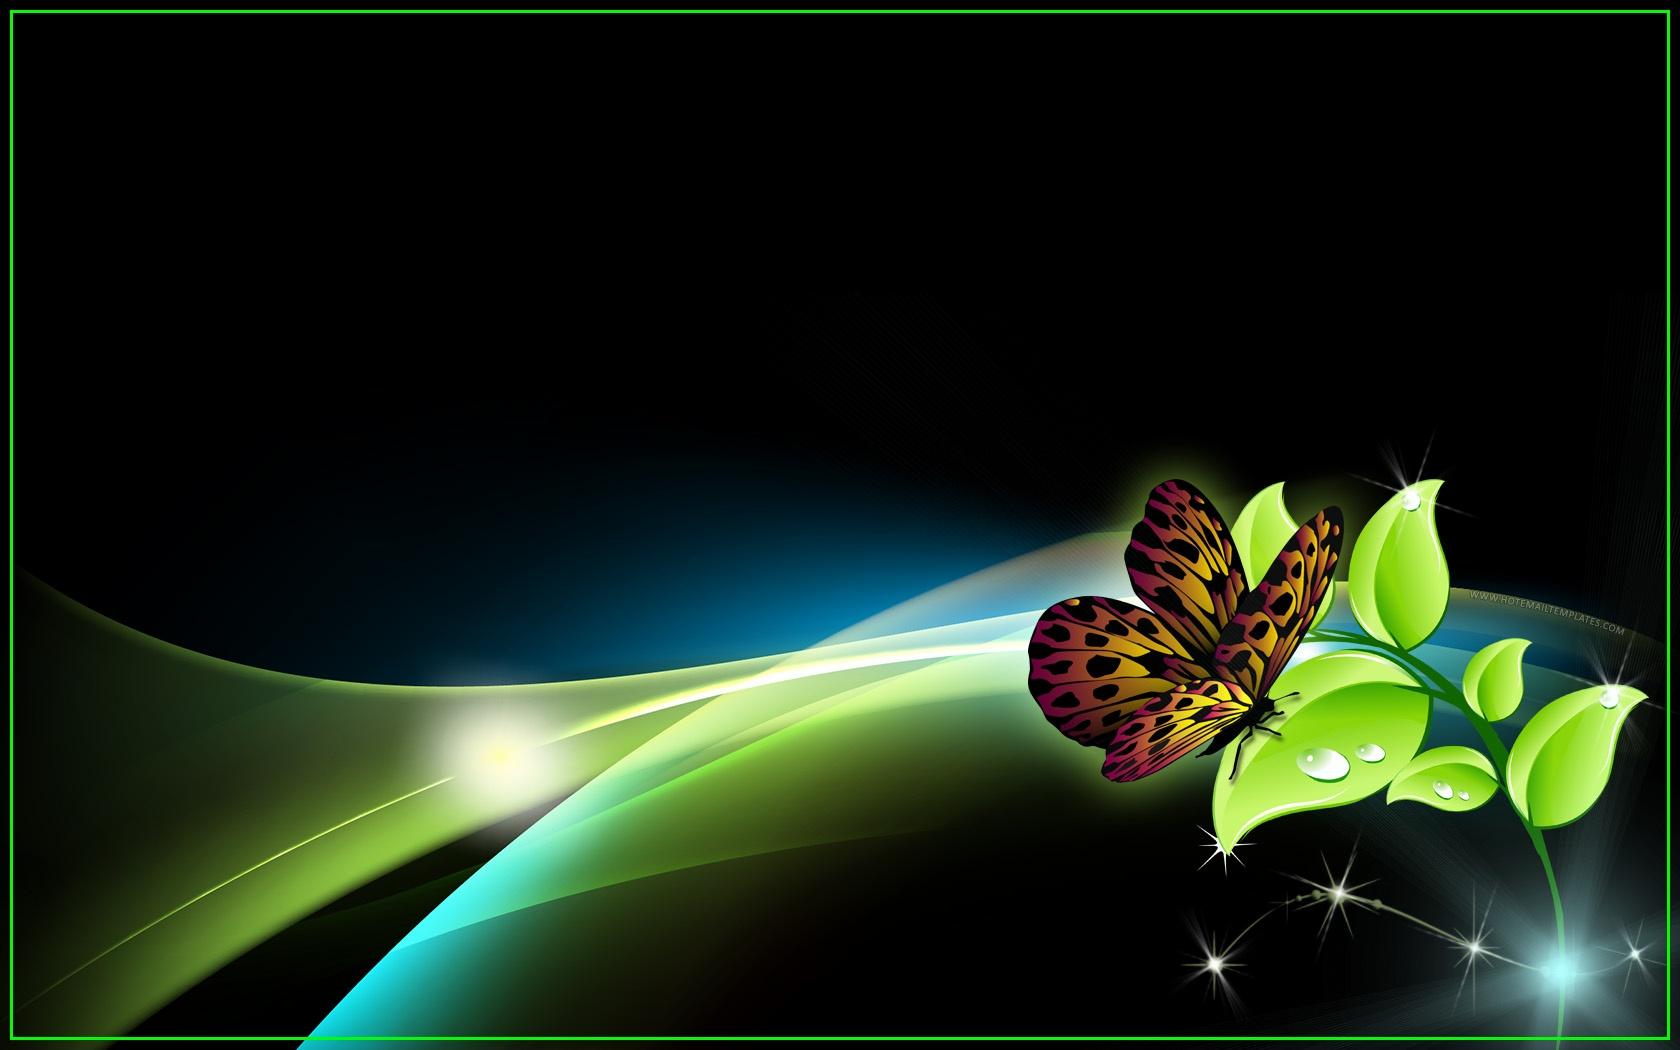 desktop apple microsoft wallpapers for desktop jpg filesize 1680x1050 1680x1050